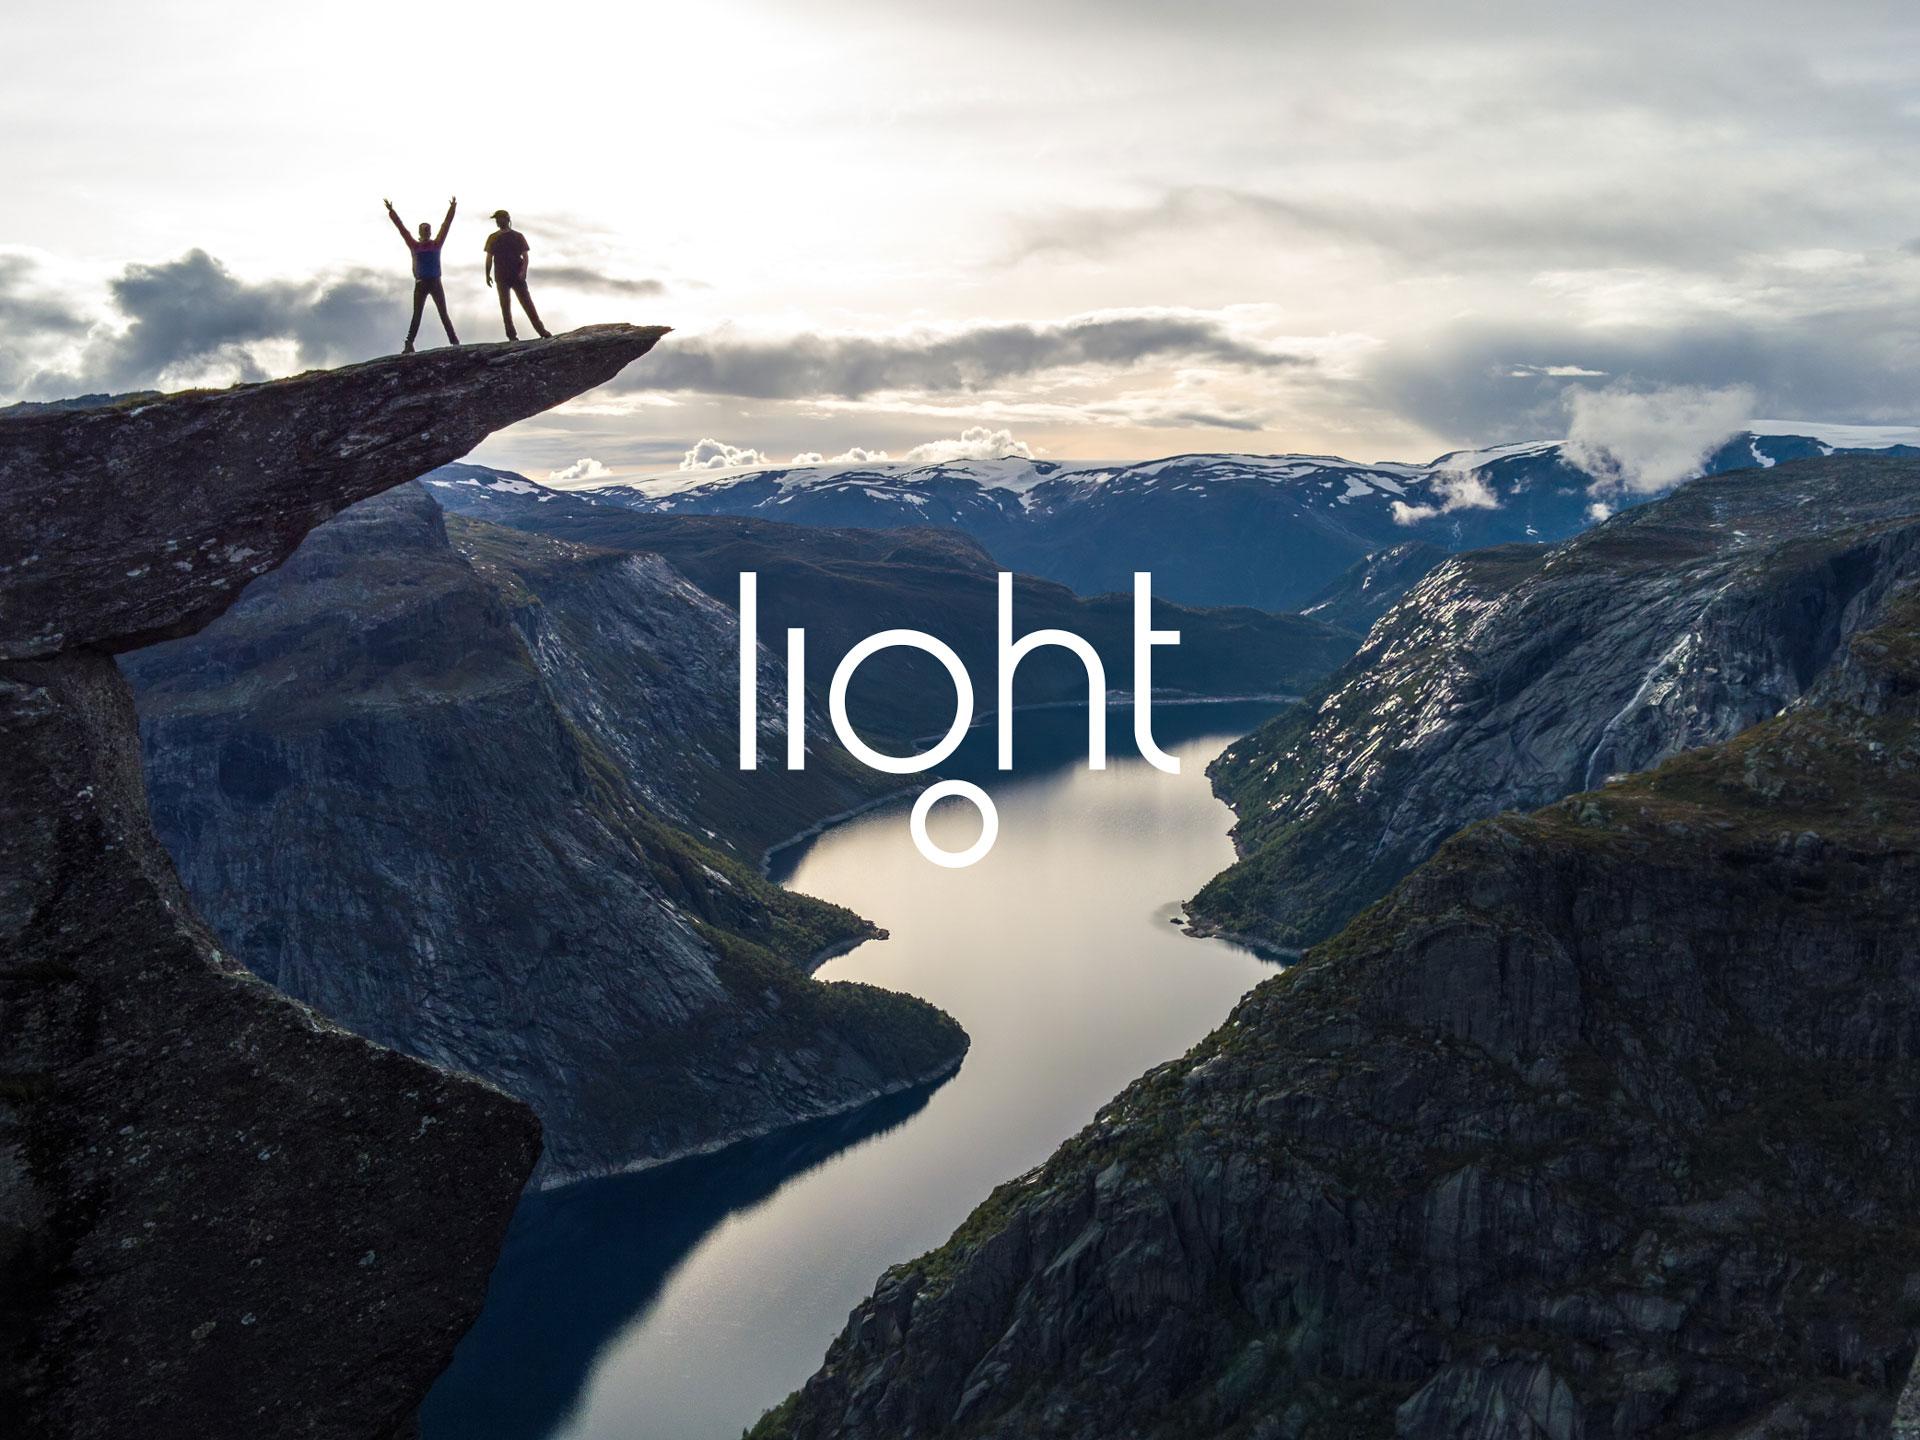 Light - feature